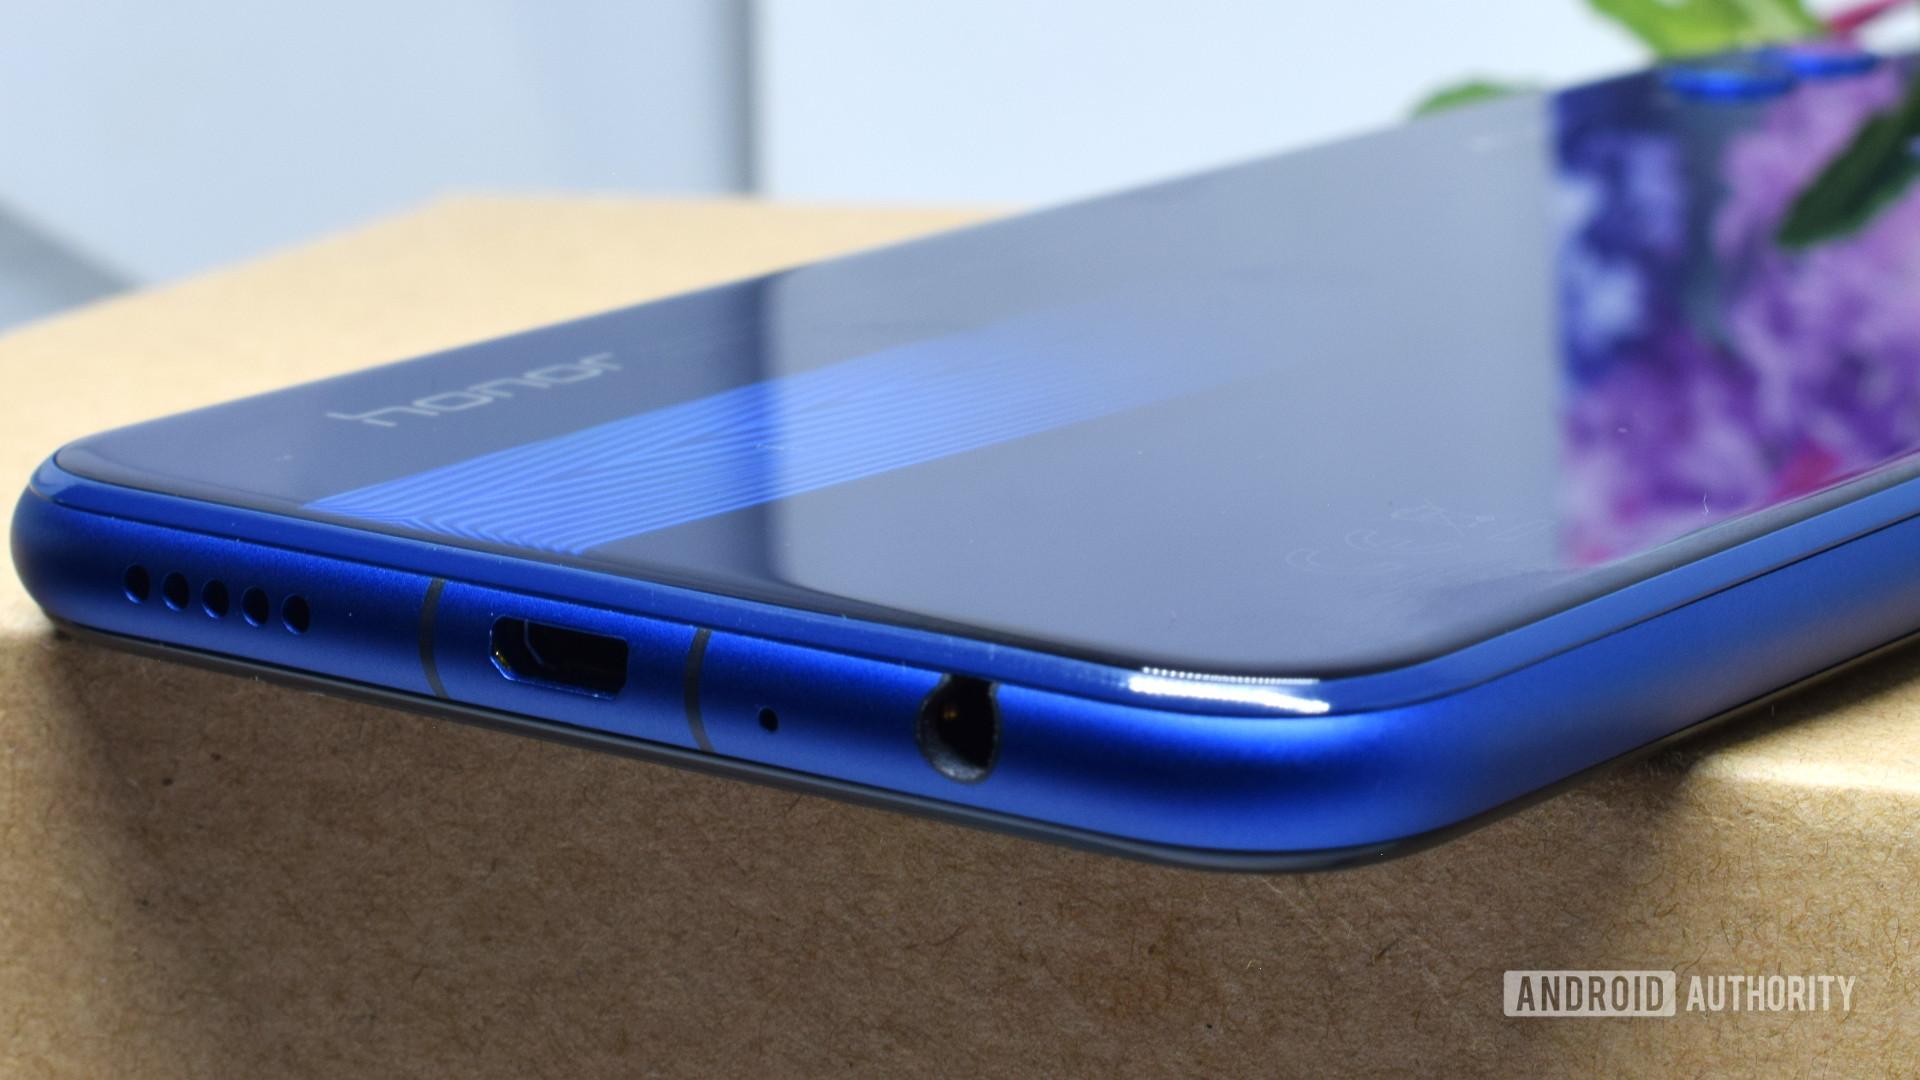 Blue Honor 8x bottom side